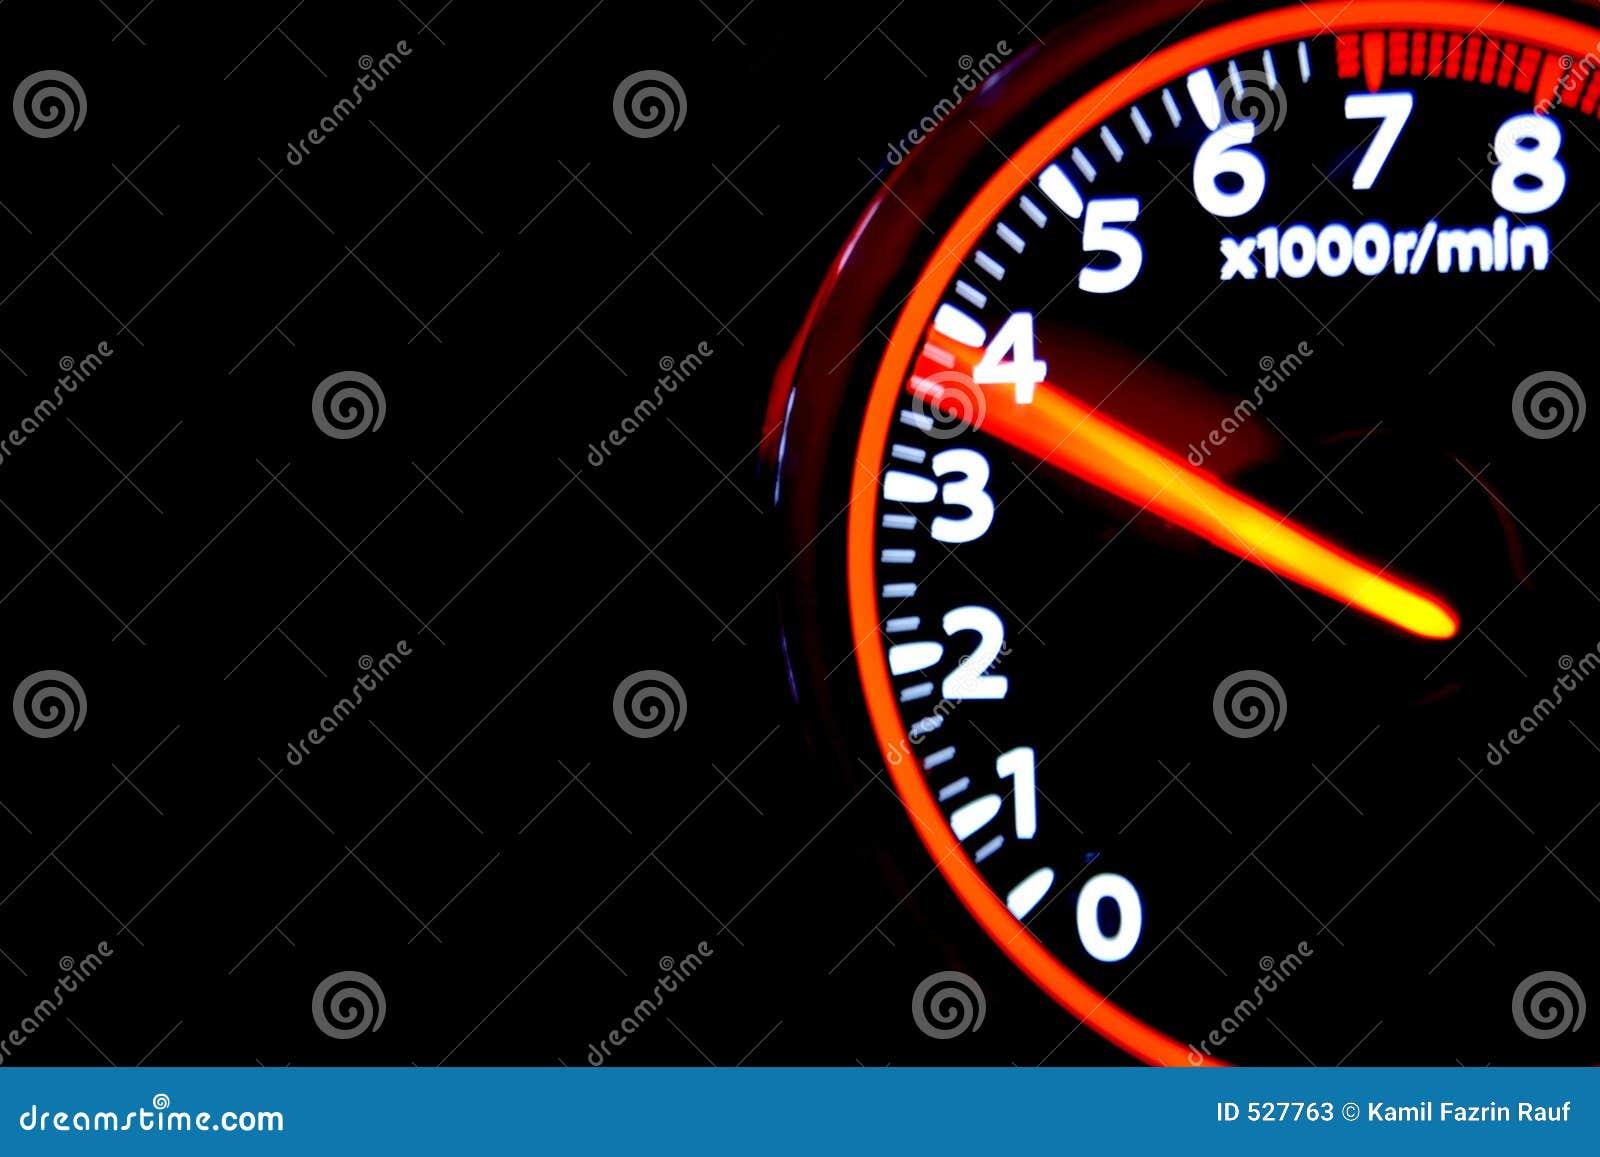 Download 米rpm 库存图片. 图片 包括有 种族, 速度, 扭矩, 红色, rev, 控制板, 拨号, 驾驶舱, 汽车 - 527763